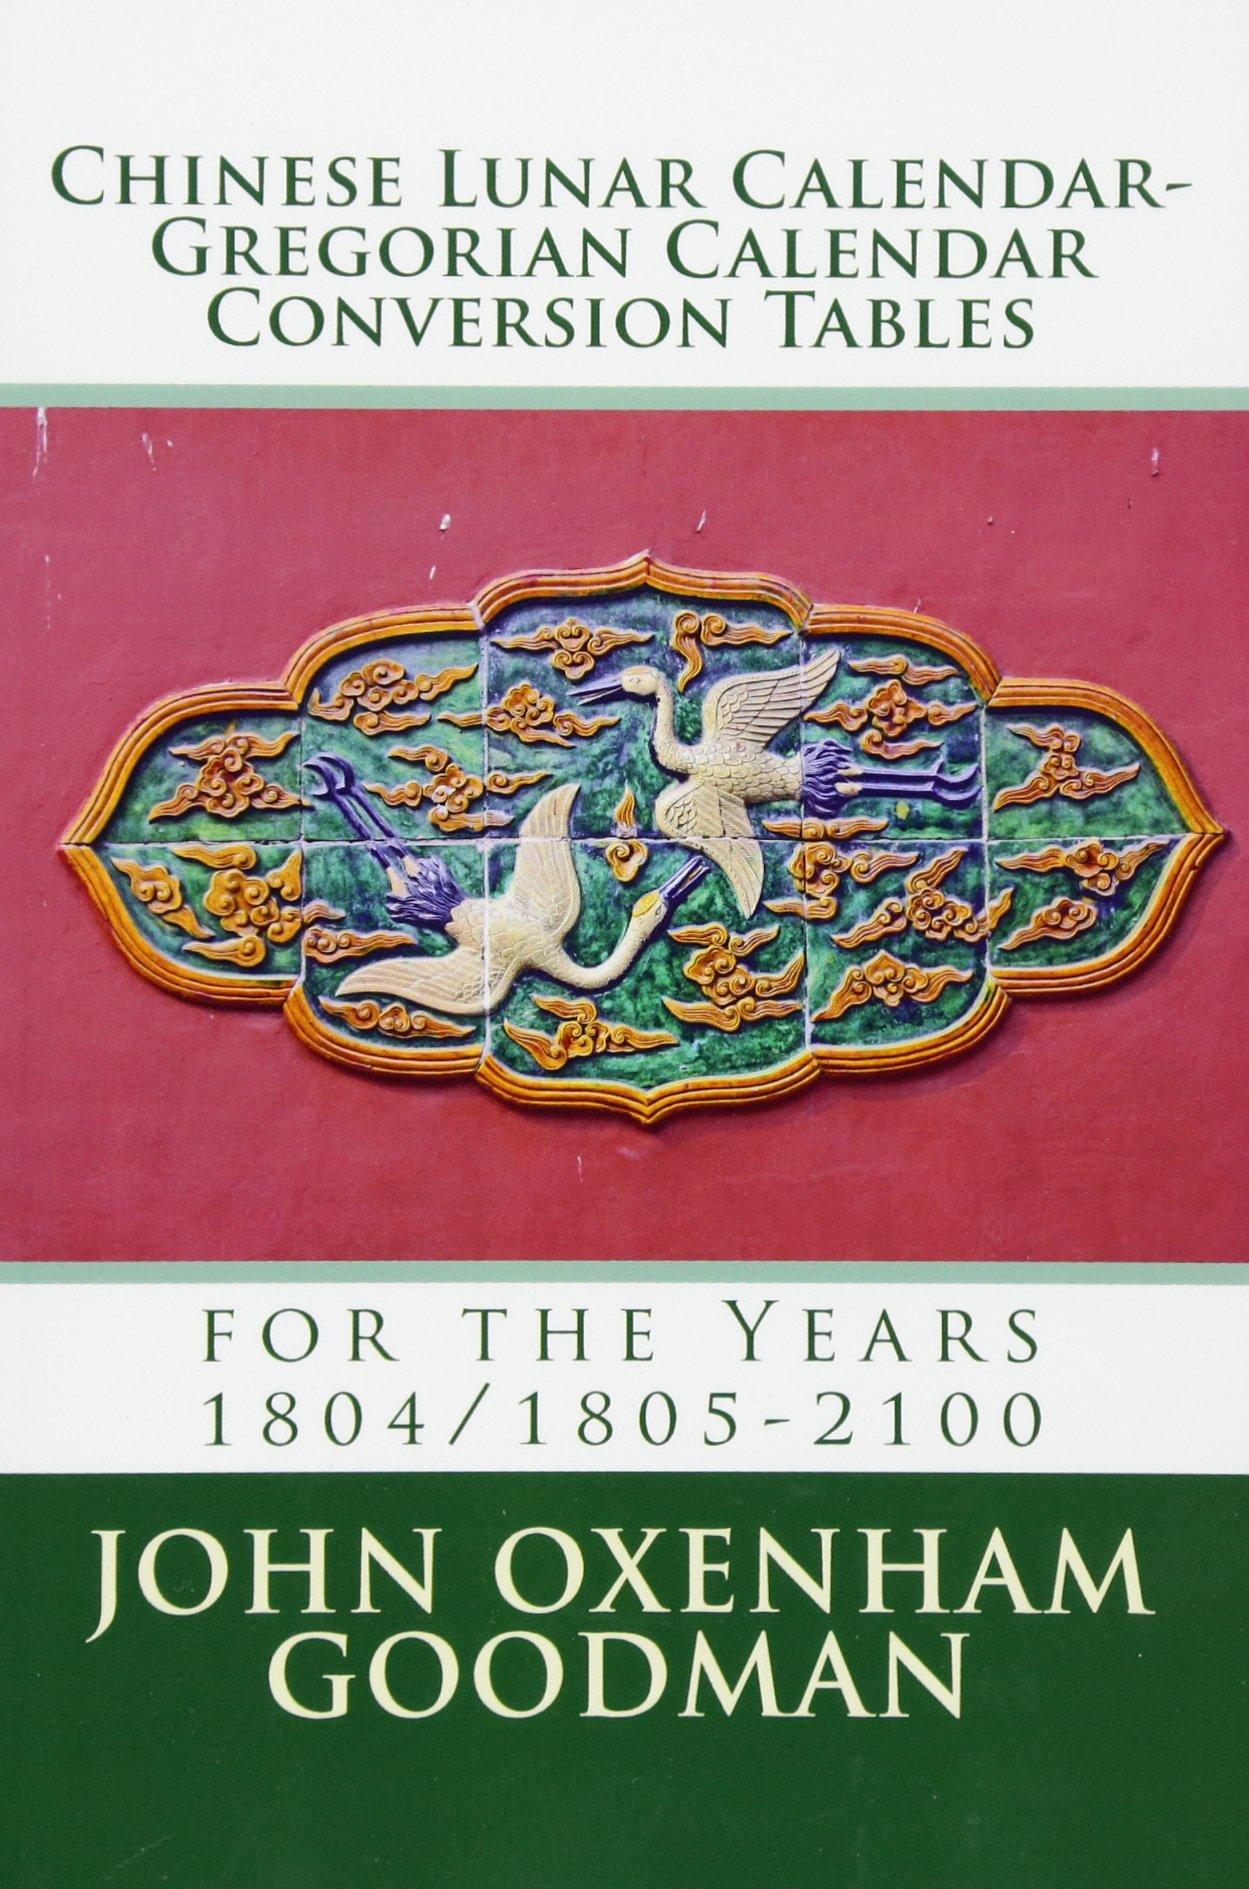 Chinese Lunar Calendar-Gregorian Calendar Conversion Tables